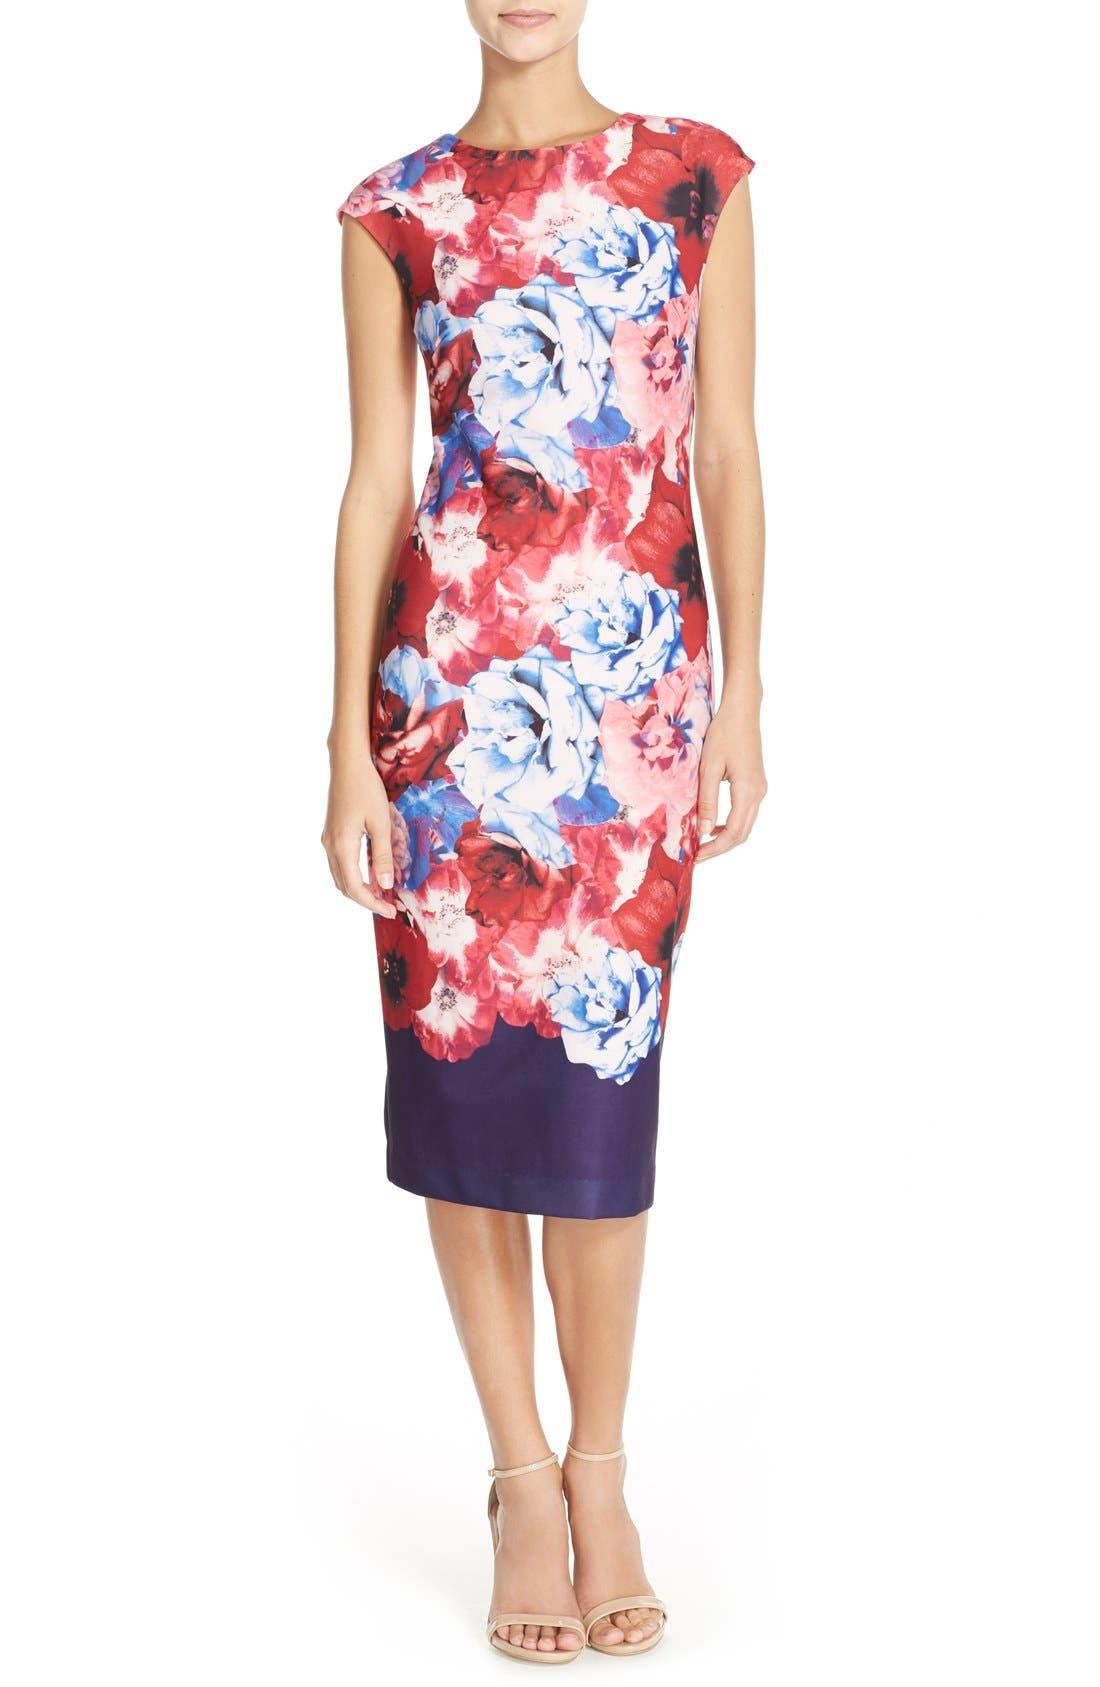 Alternate Image 1 Selected - Vince Camuto Floral Print Stretch Midi Dress (Regular & Petite)